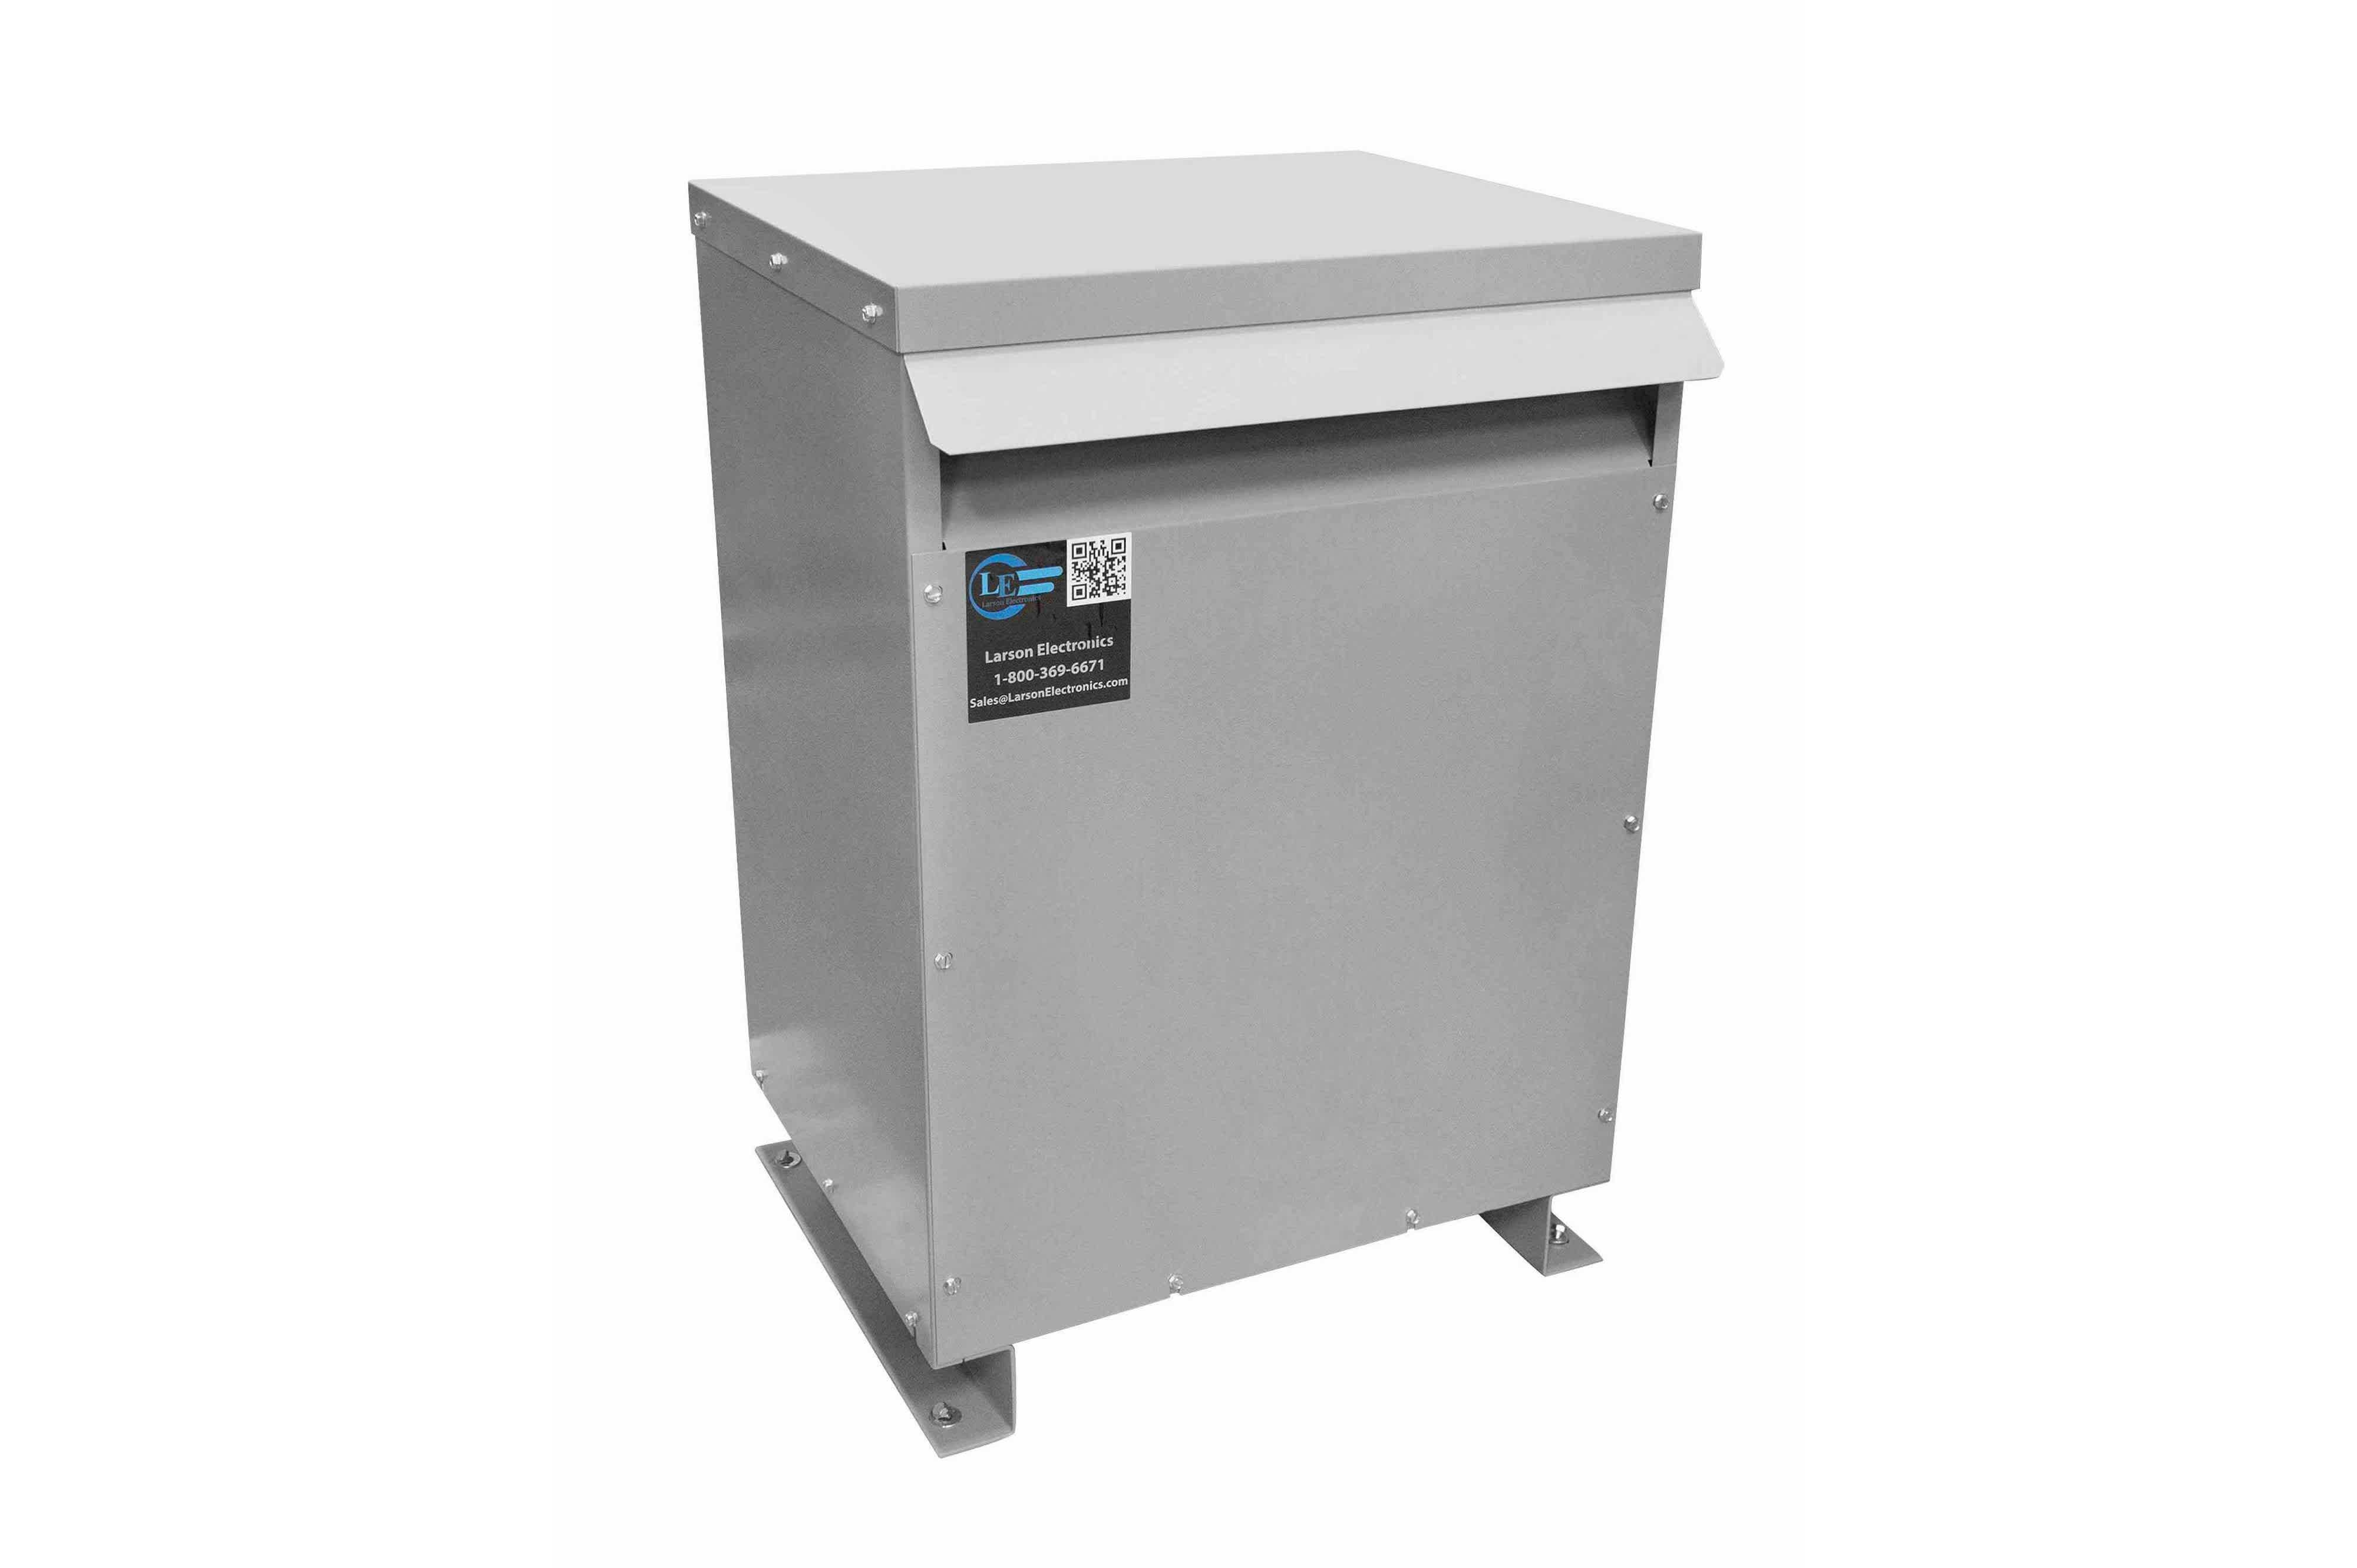 167 kVA 3PH DOE Transformer, 220V Delta Primary, 208Y/120 Wye-N Secondary, N3R, Ventilated, 60 Hz